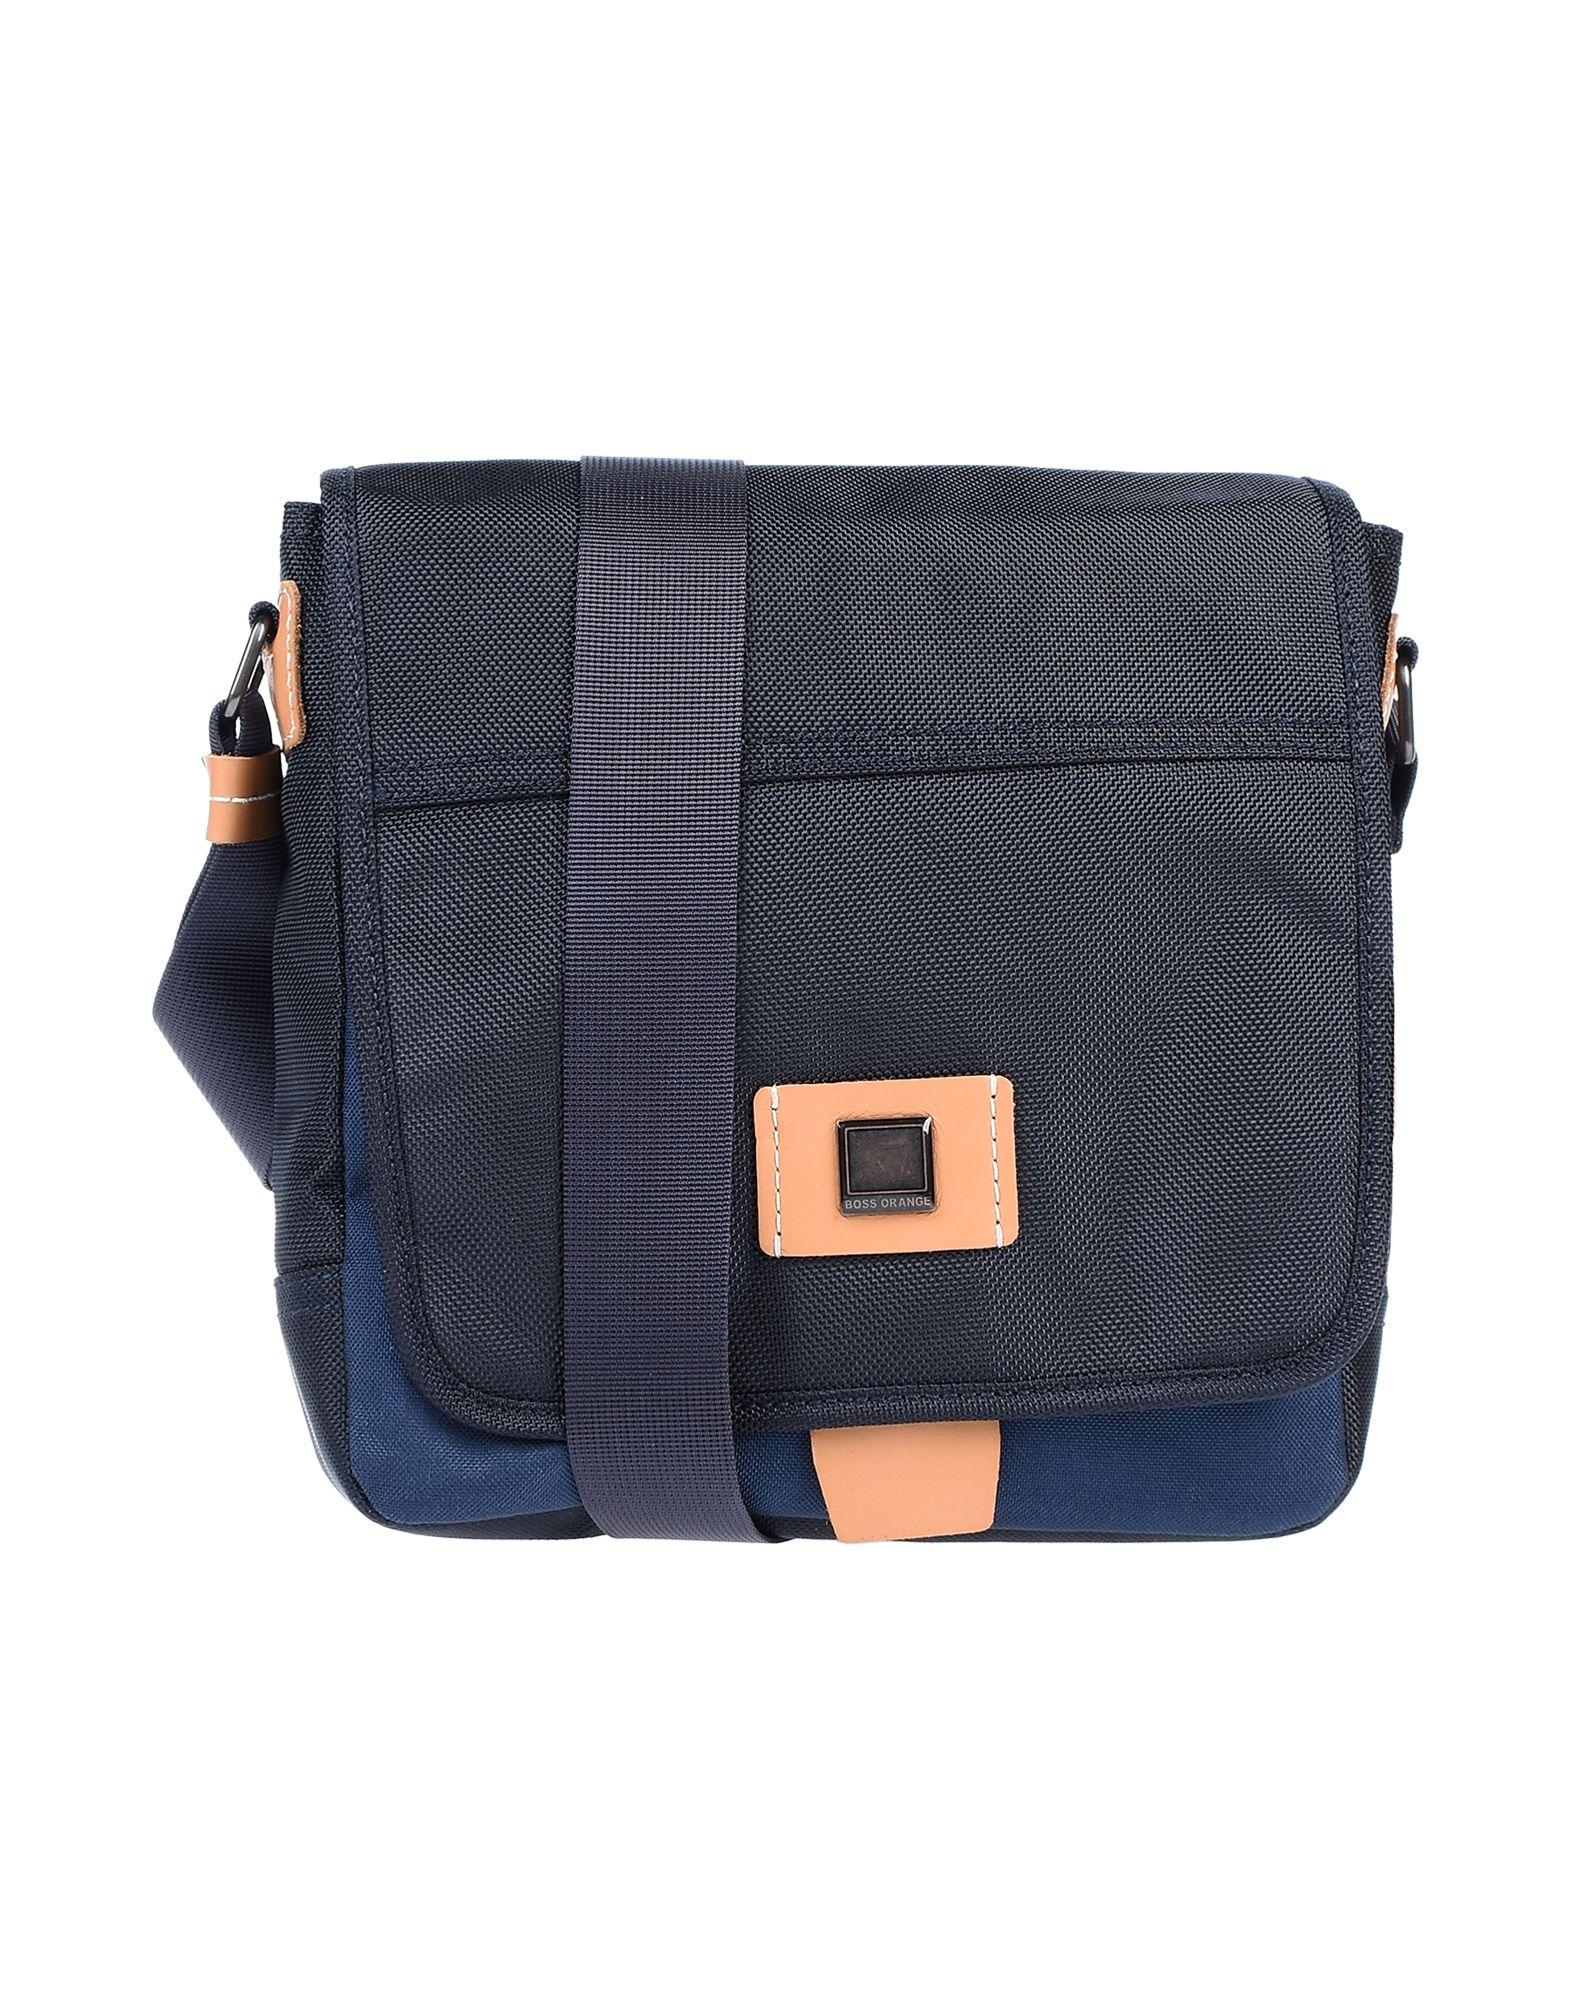 BOSS ORANGE Сумка через плечо сумка через плечо anais gvani croco ag 1471 350161